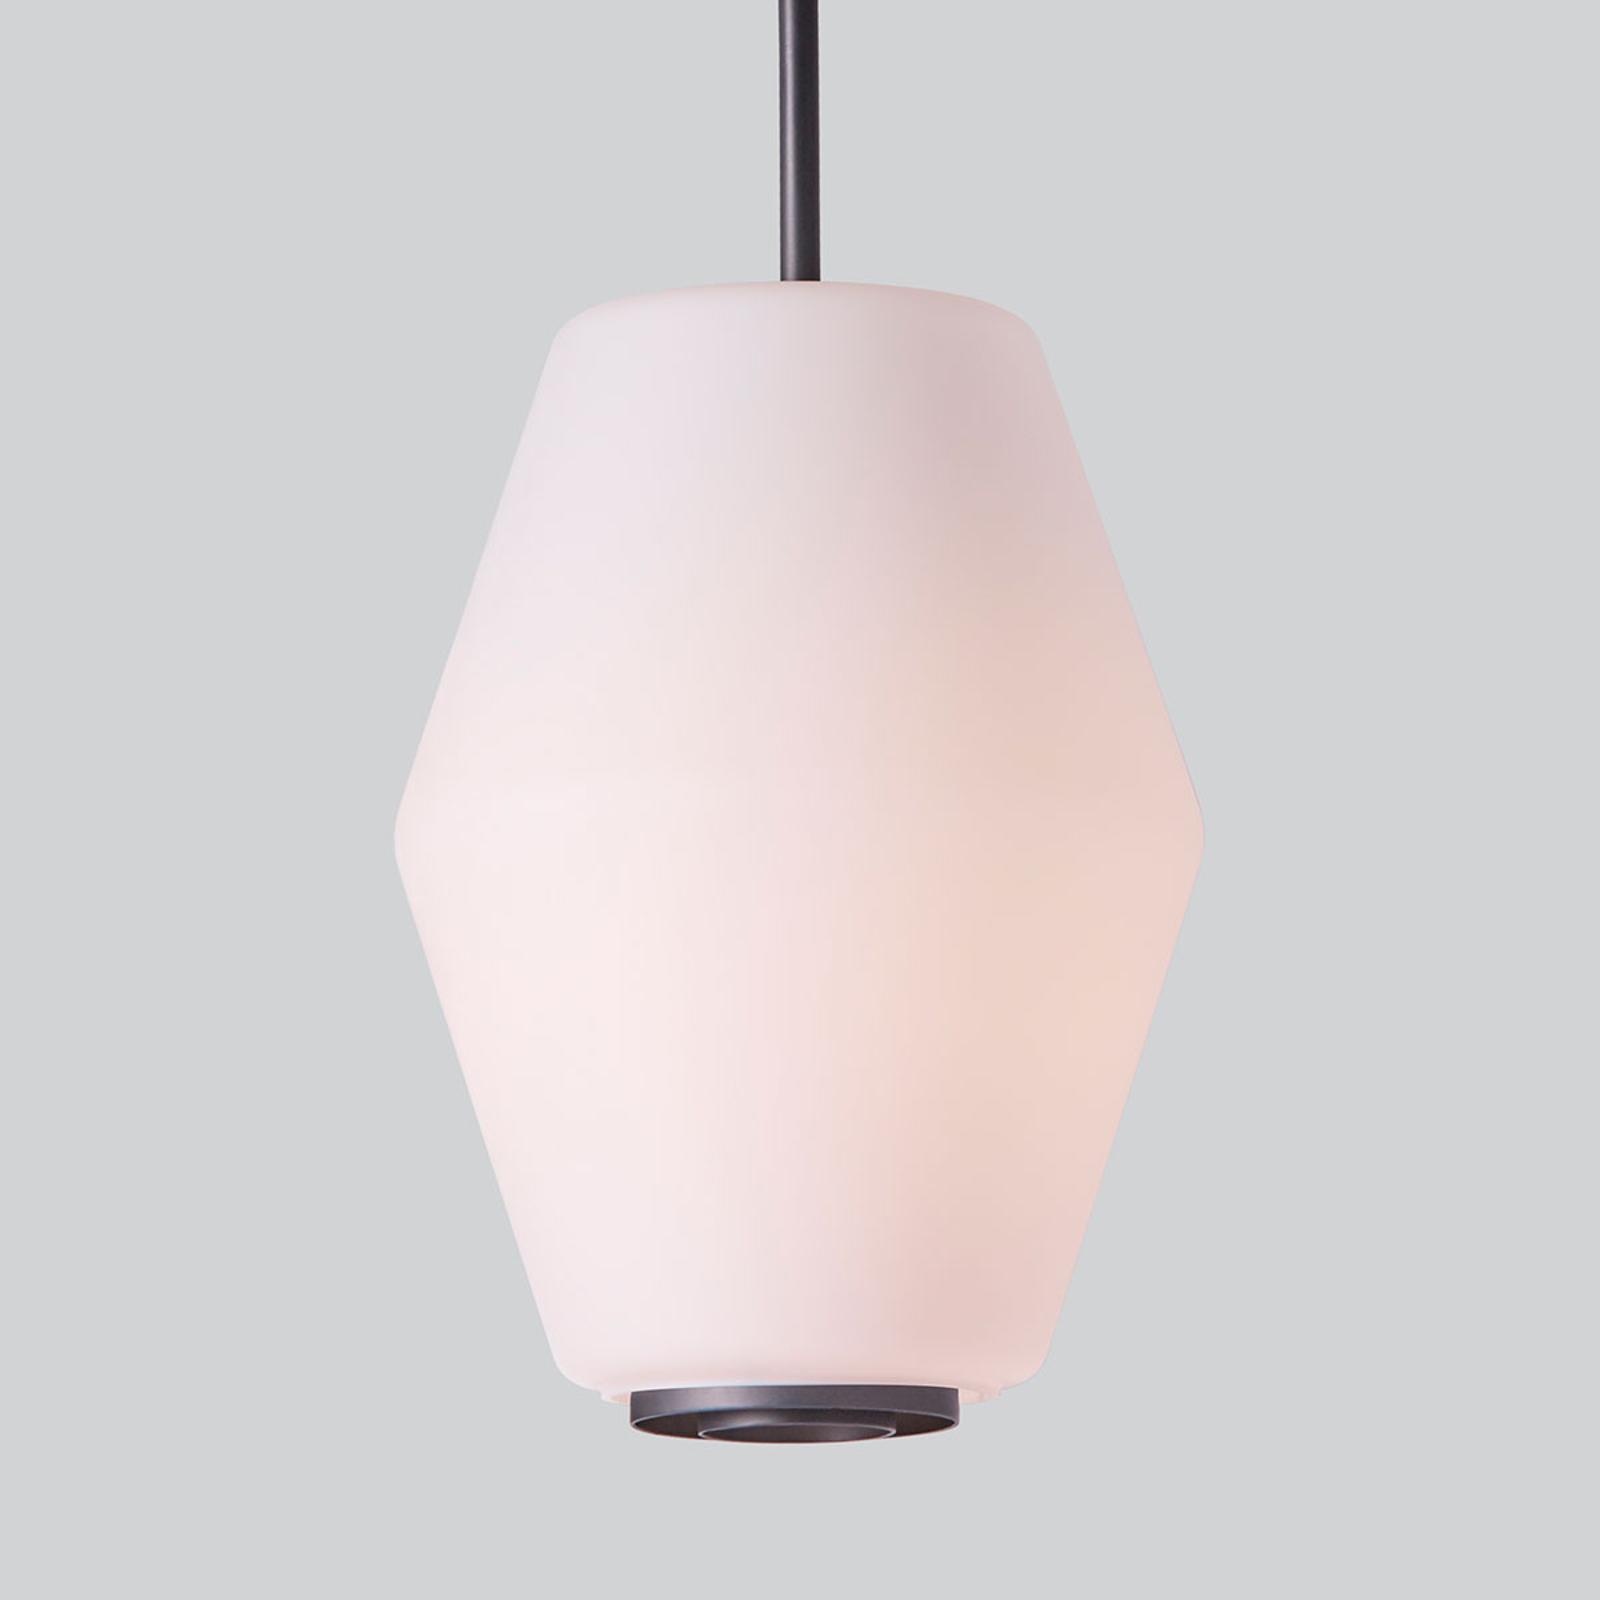 Northern Dahl lampa wisząca ciemnoszara